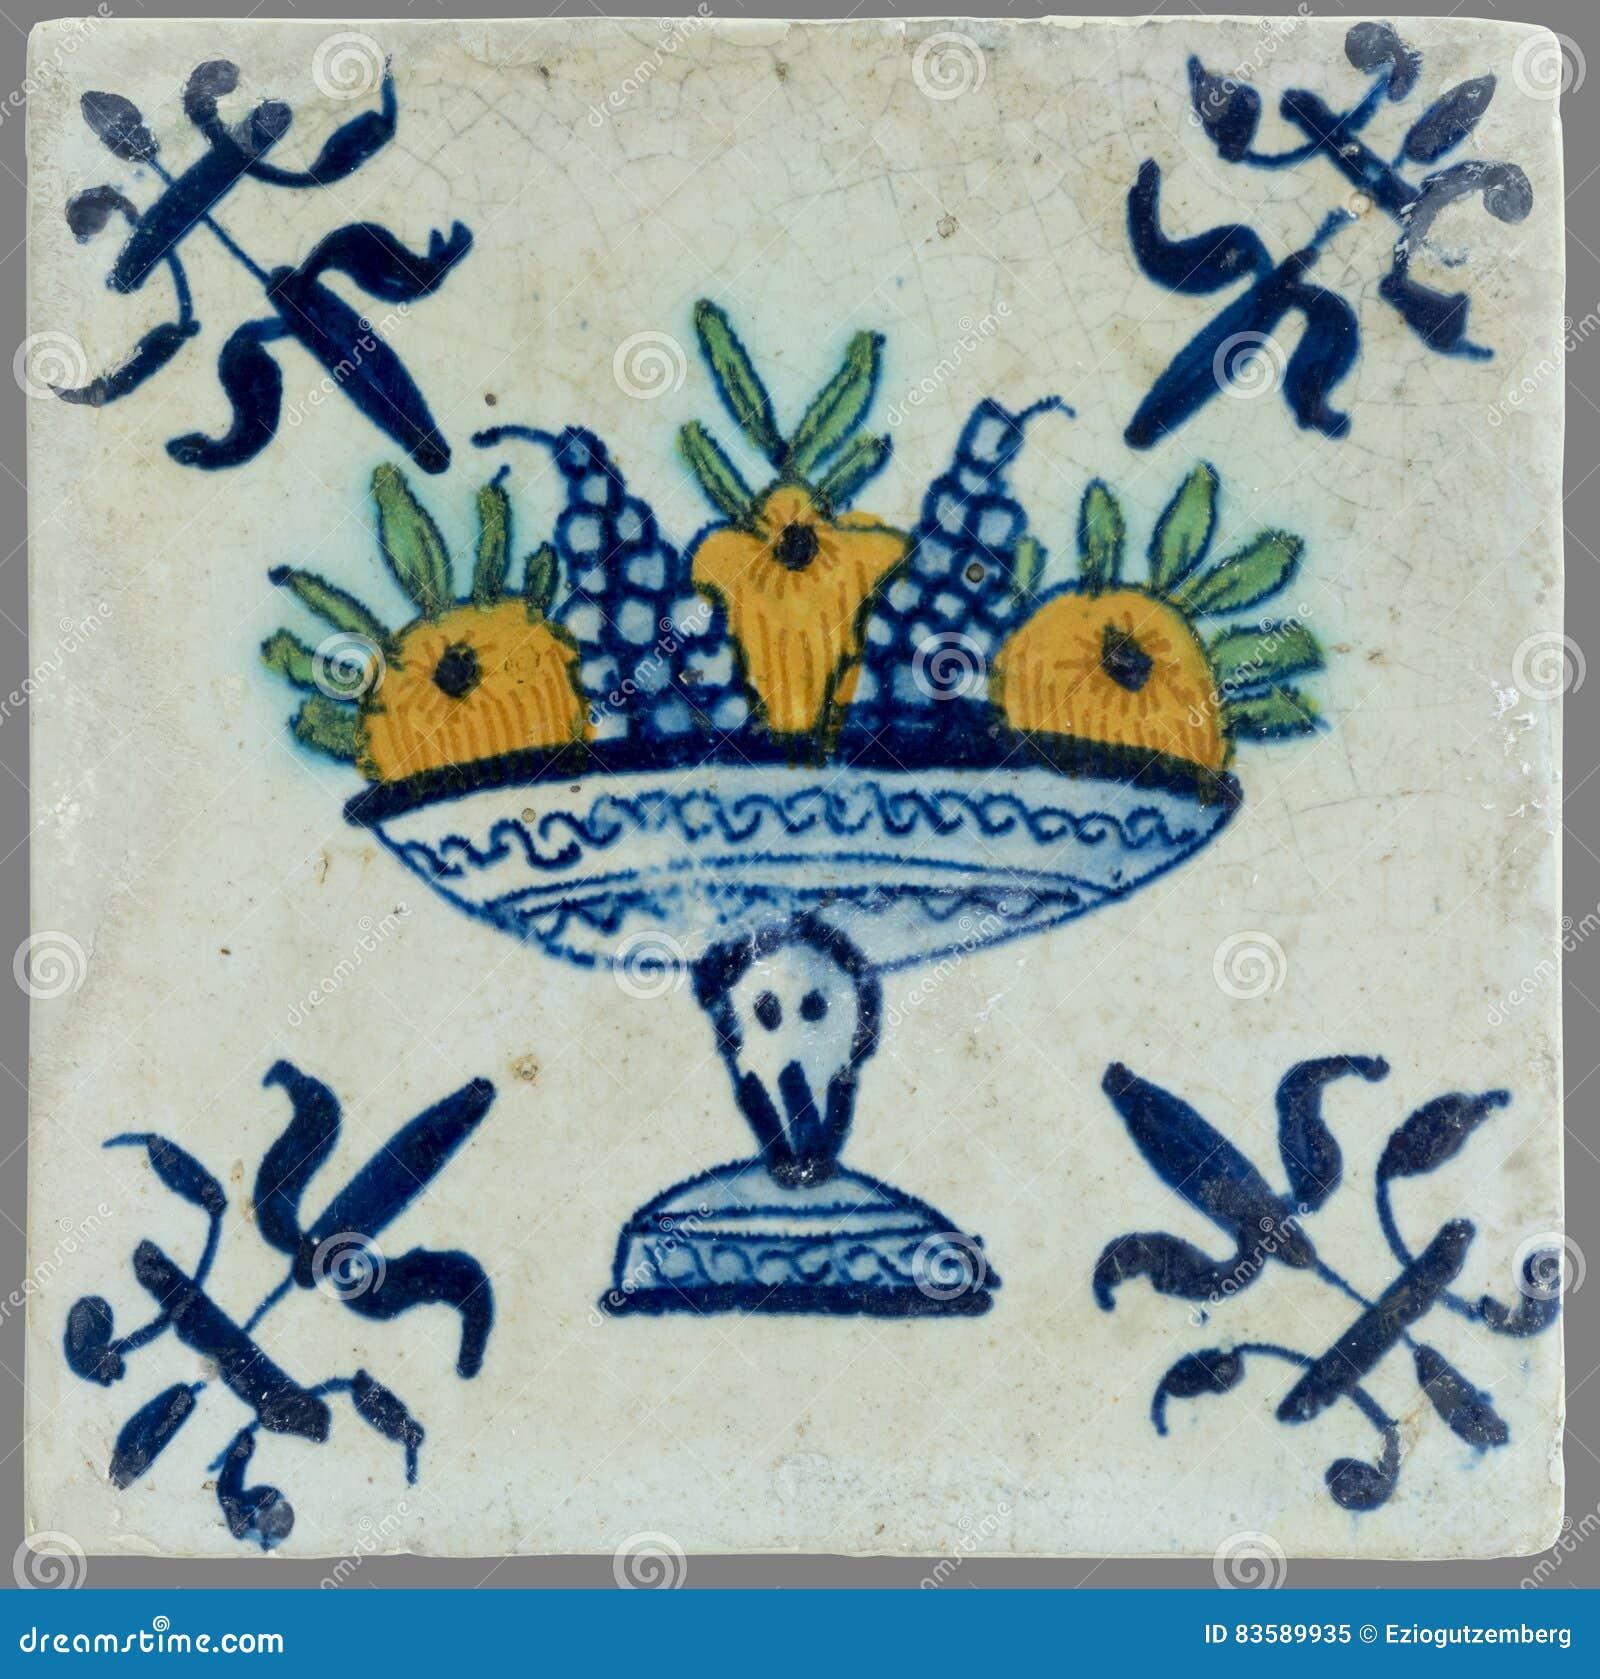 Teja holandesa del décimosexto al siglo XVIII